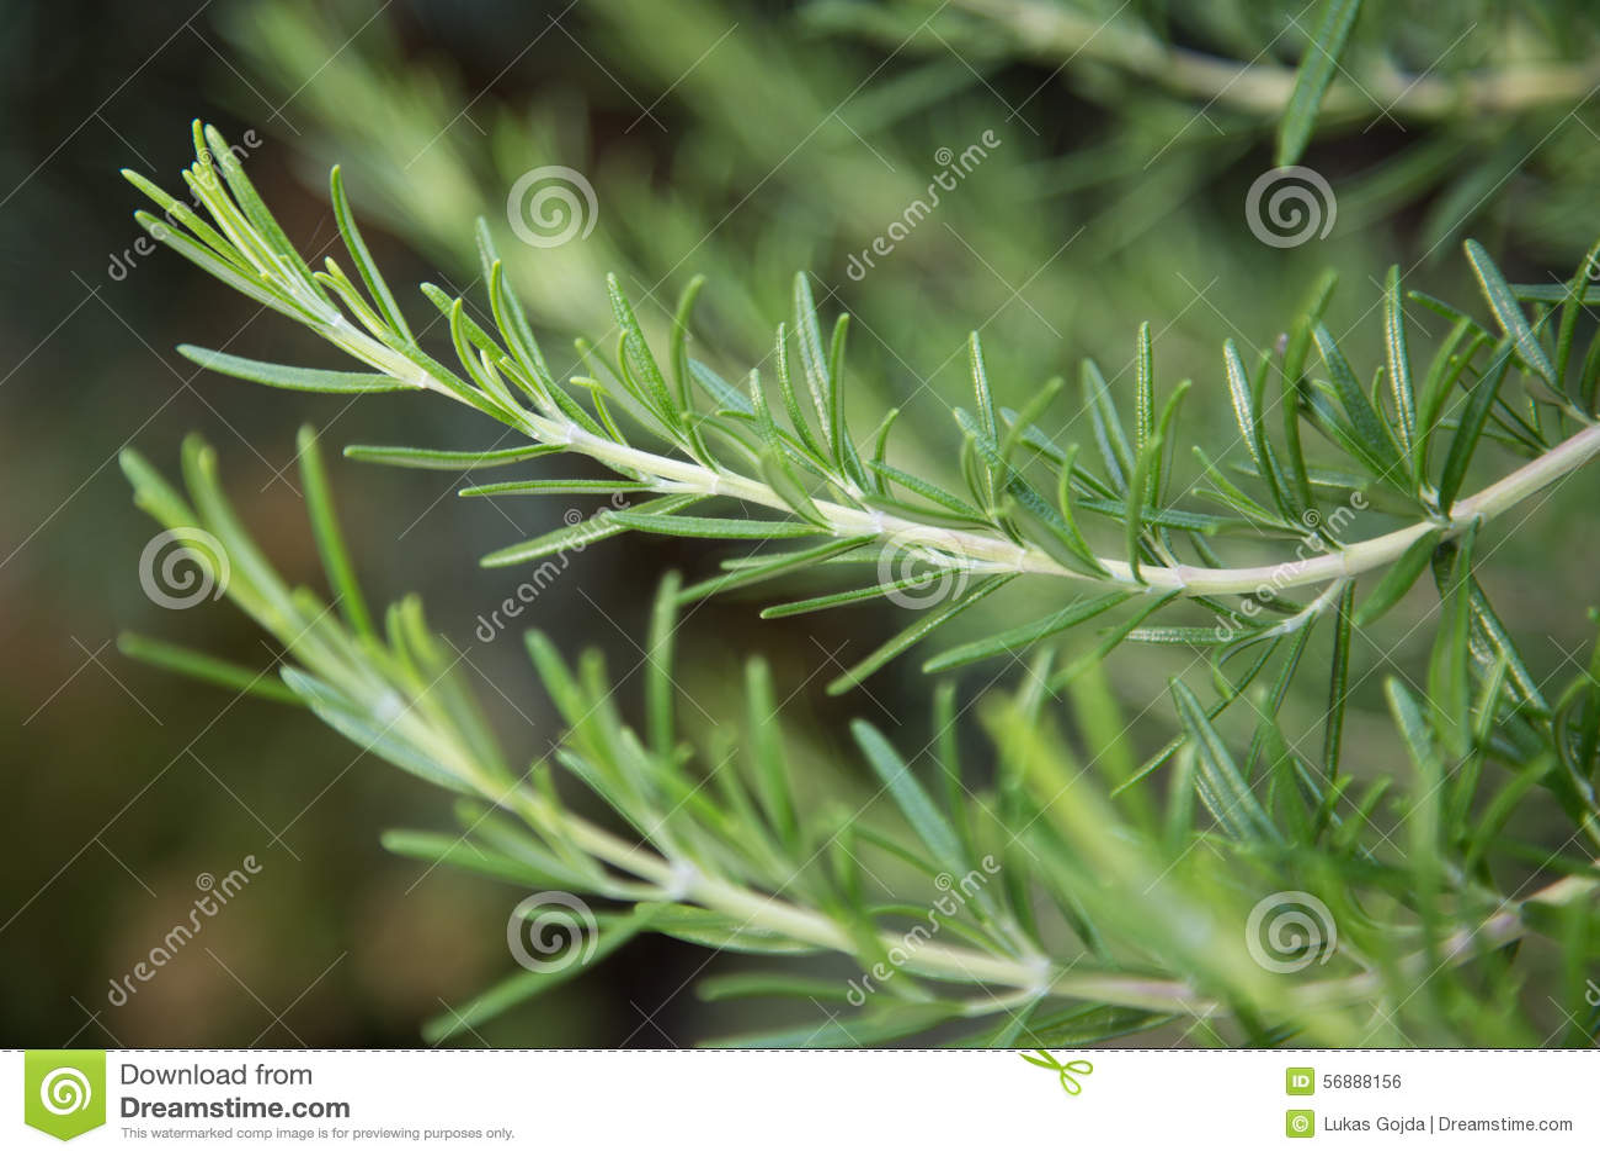 Verse Rosemary Herb